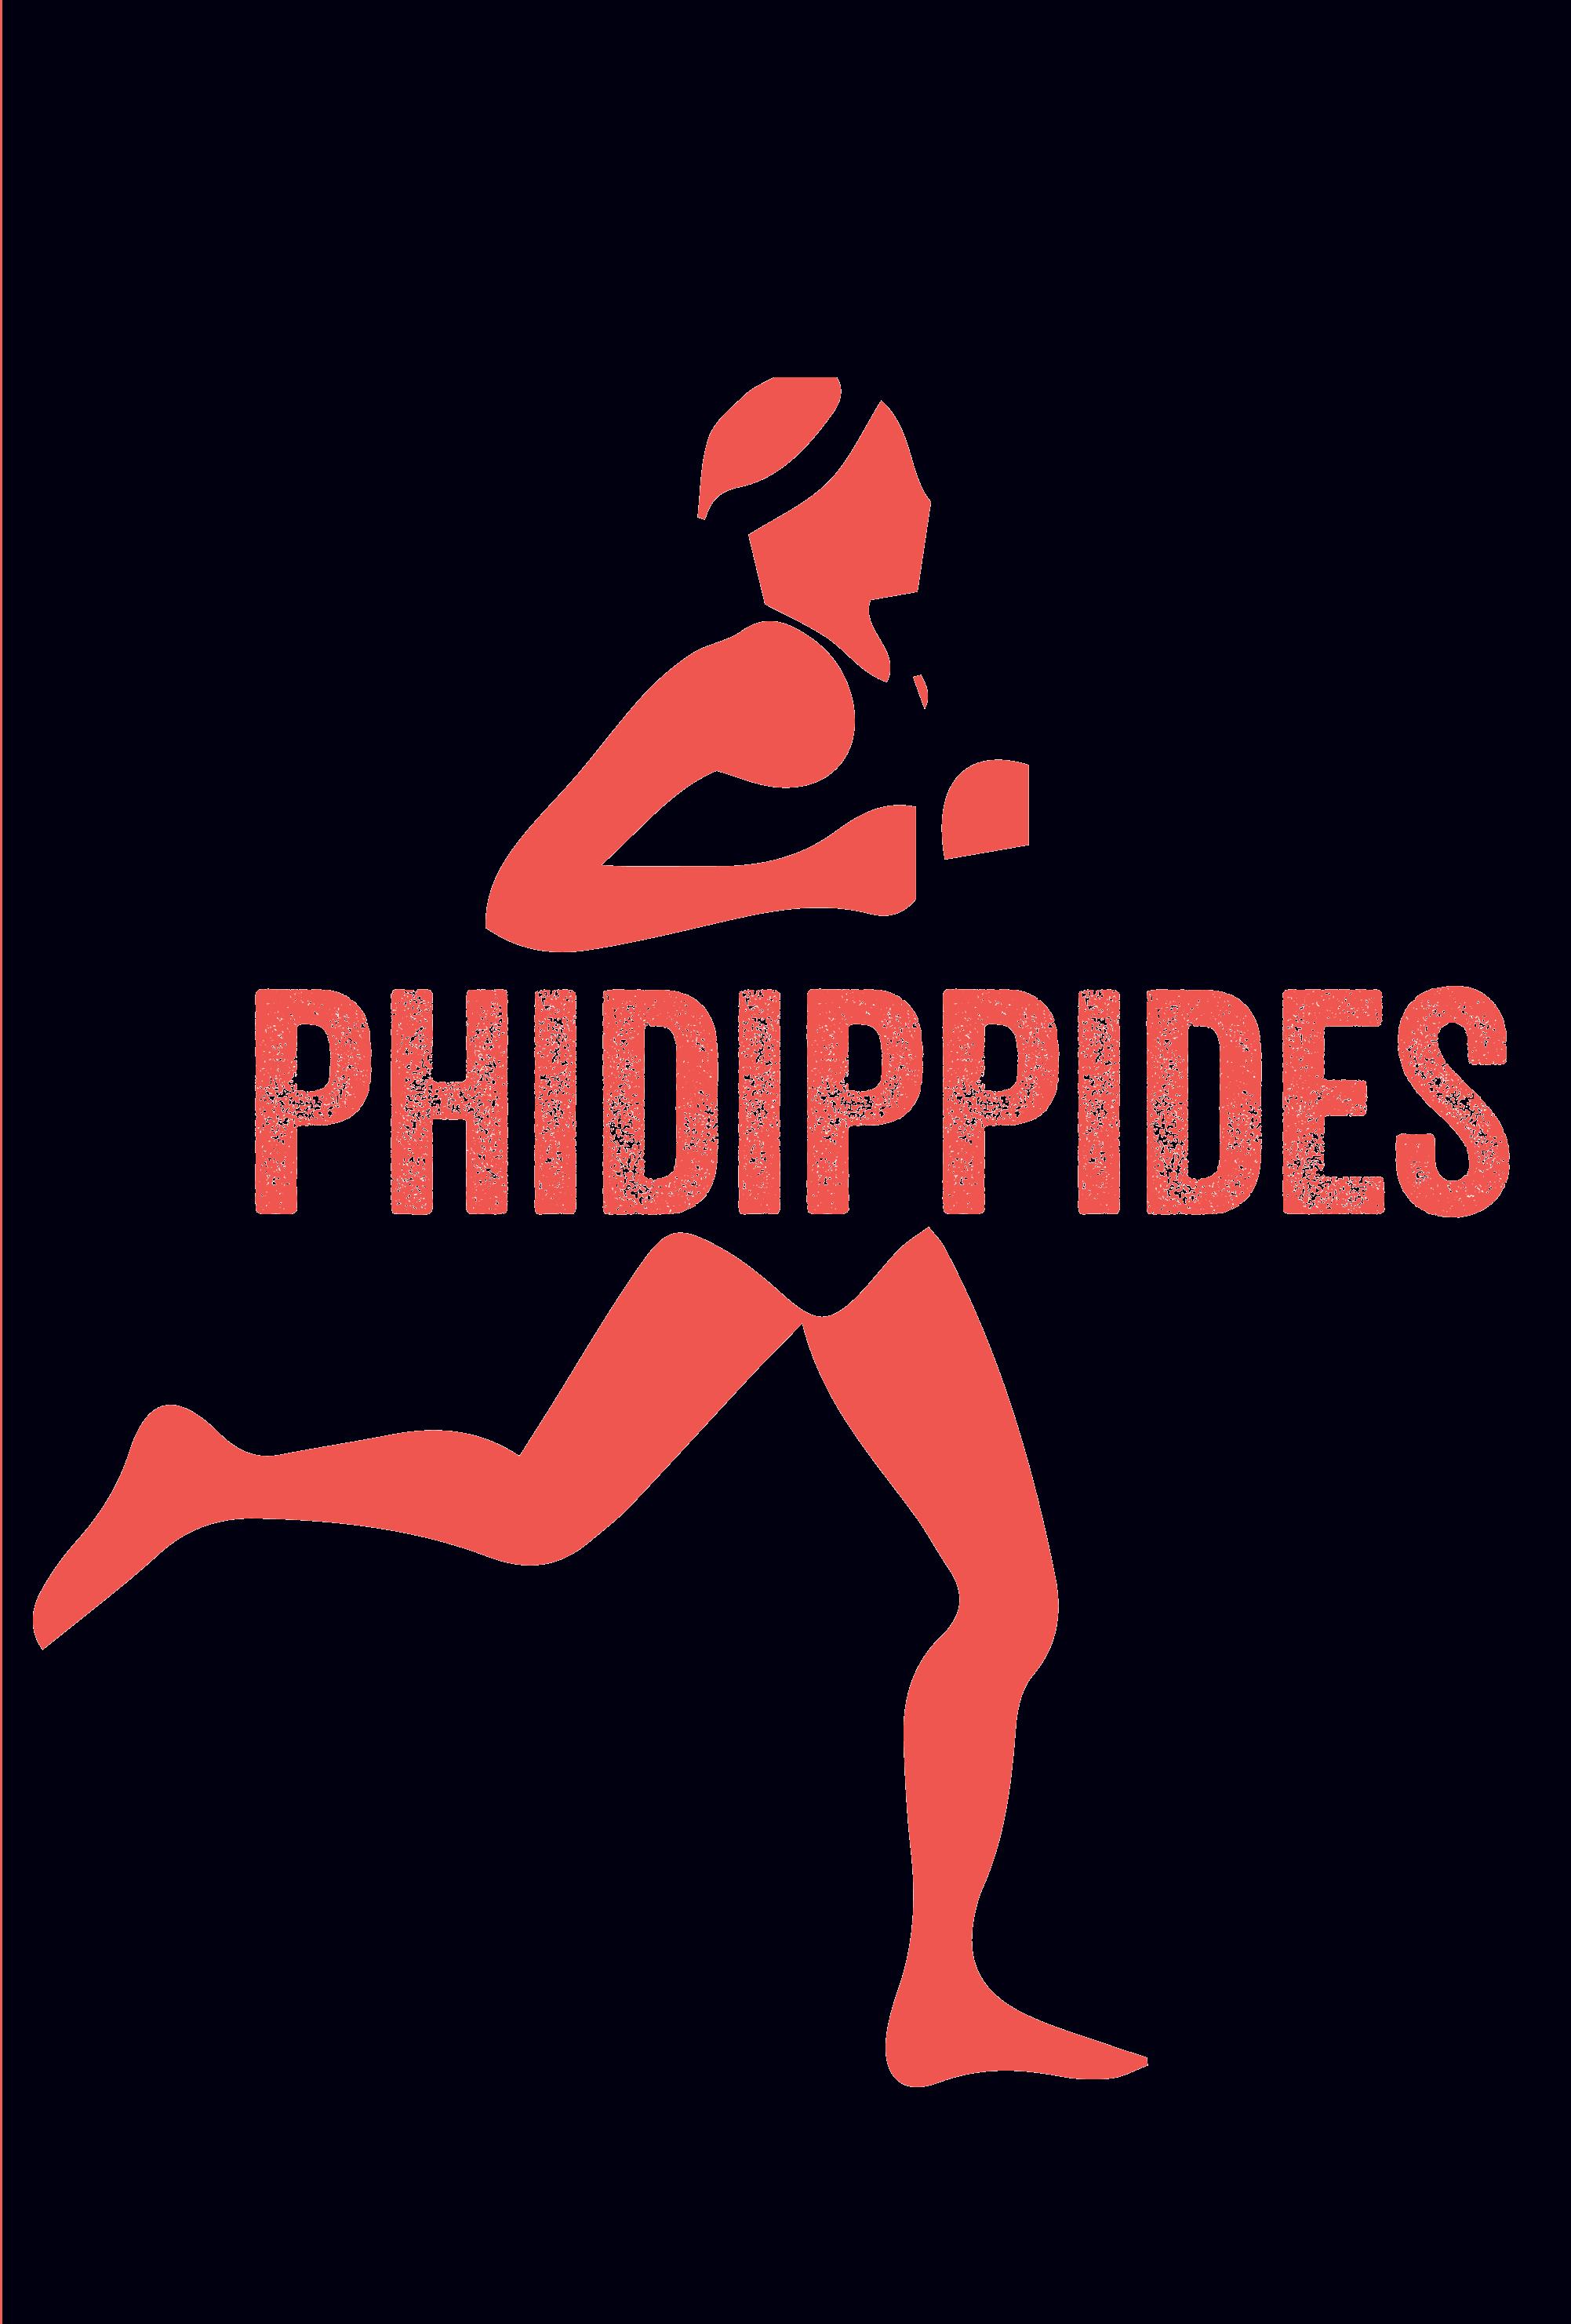 Phidippides